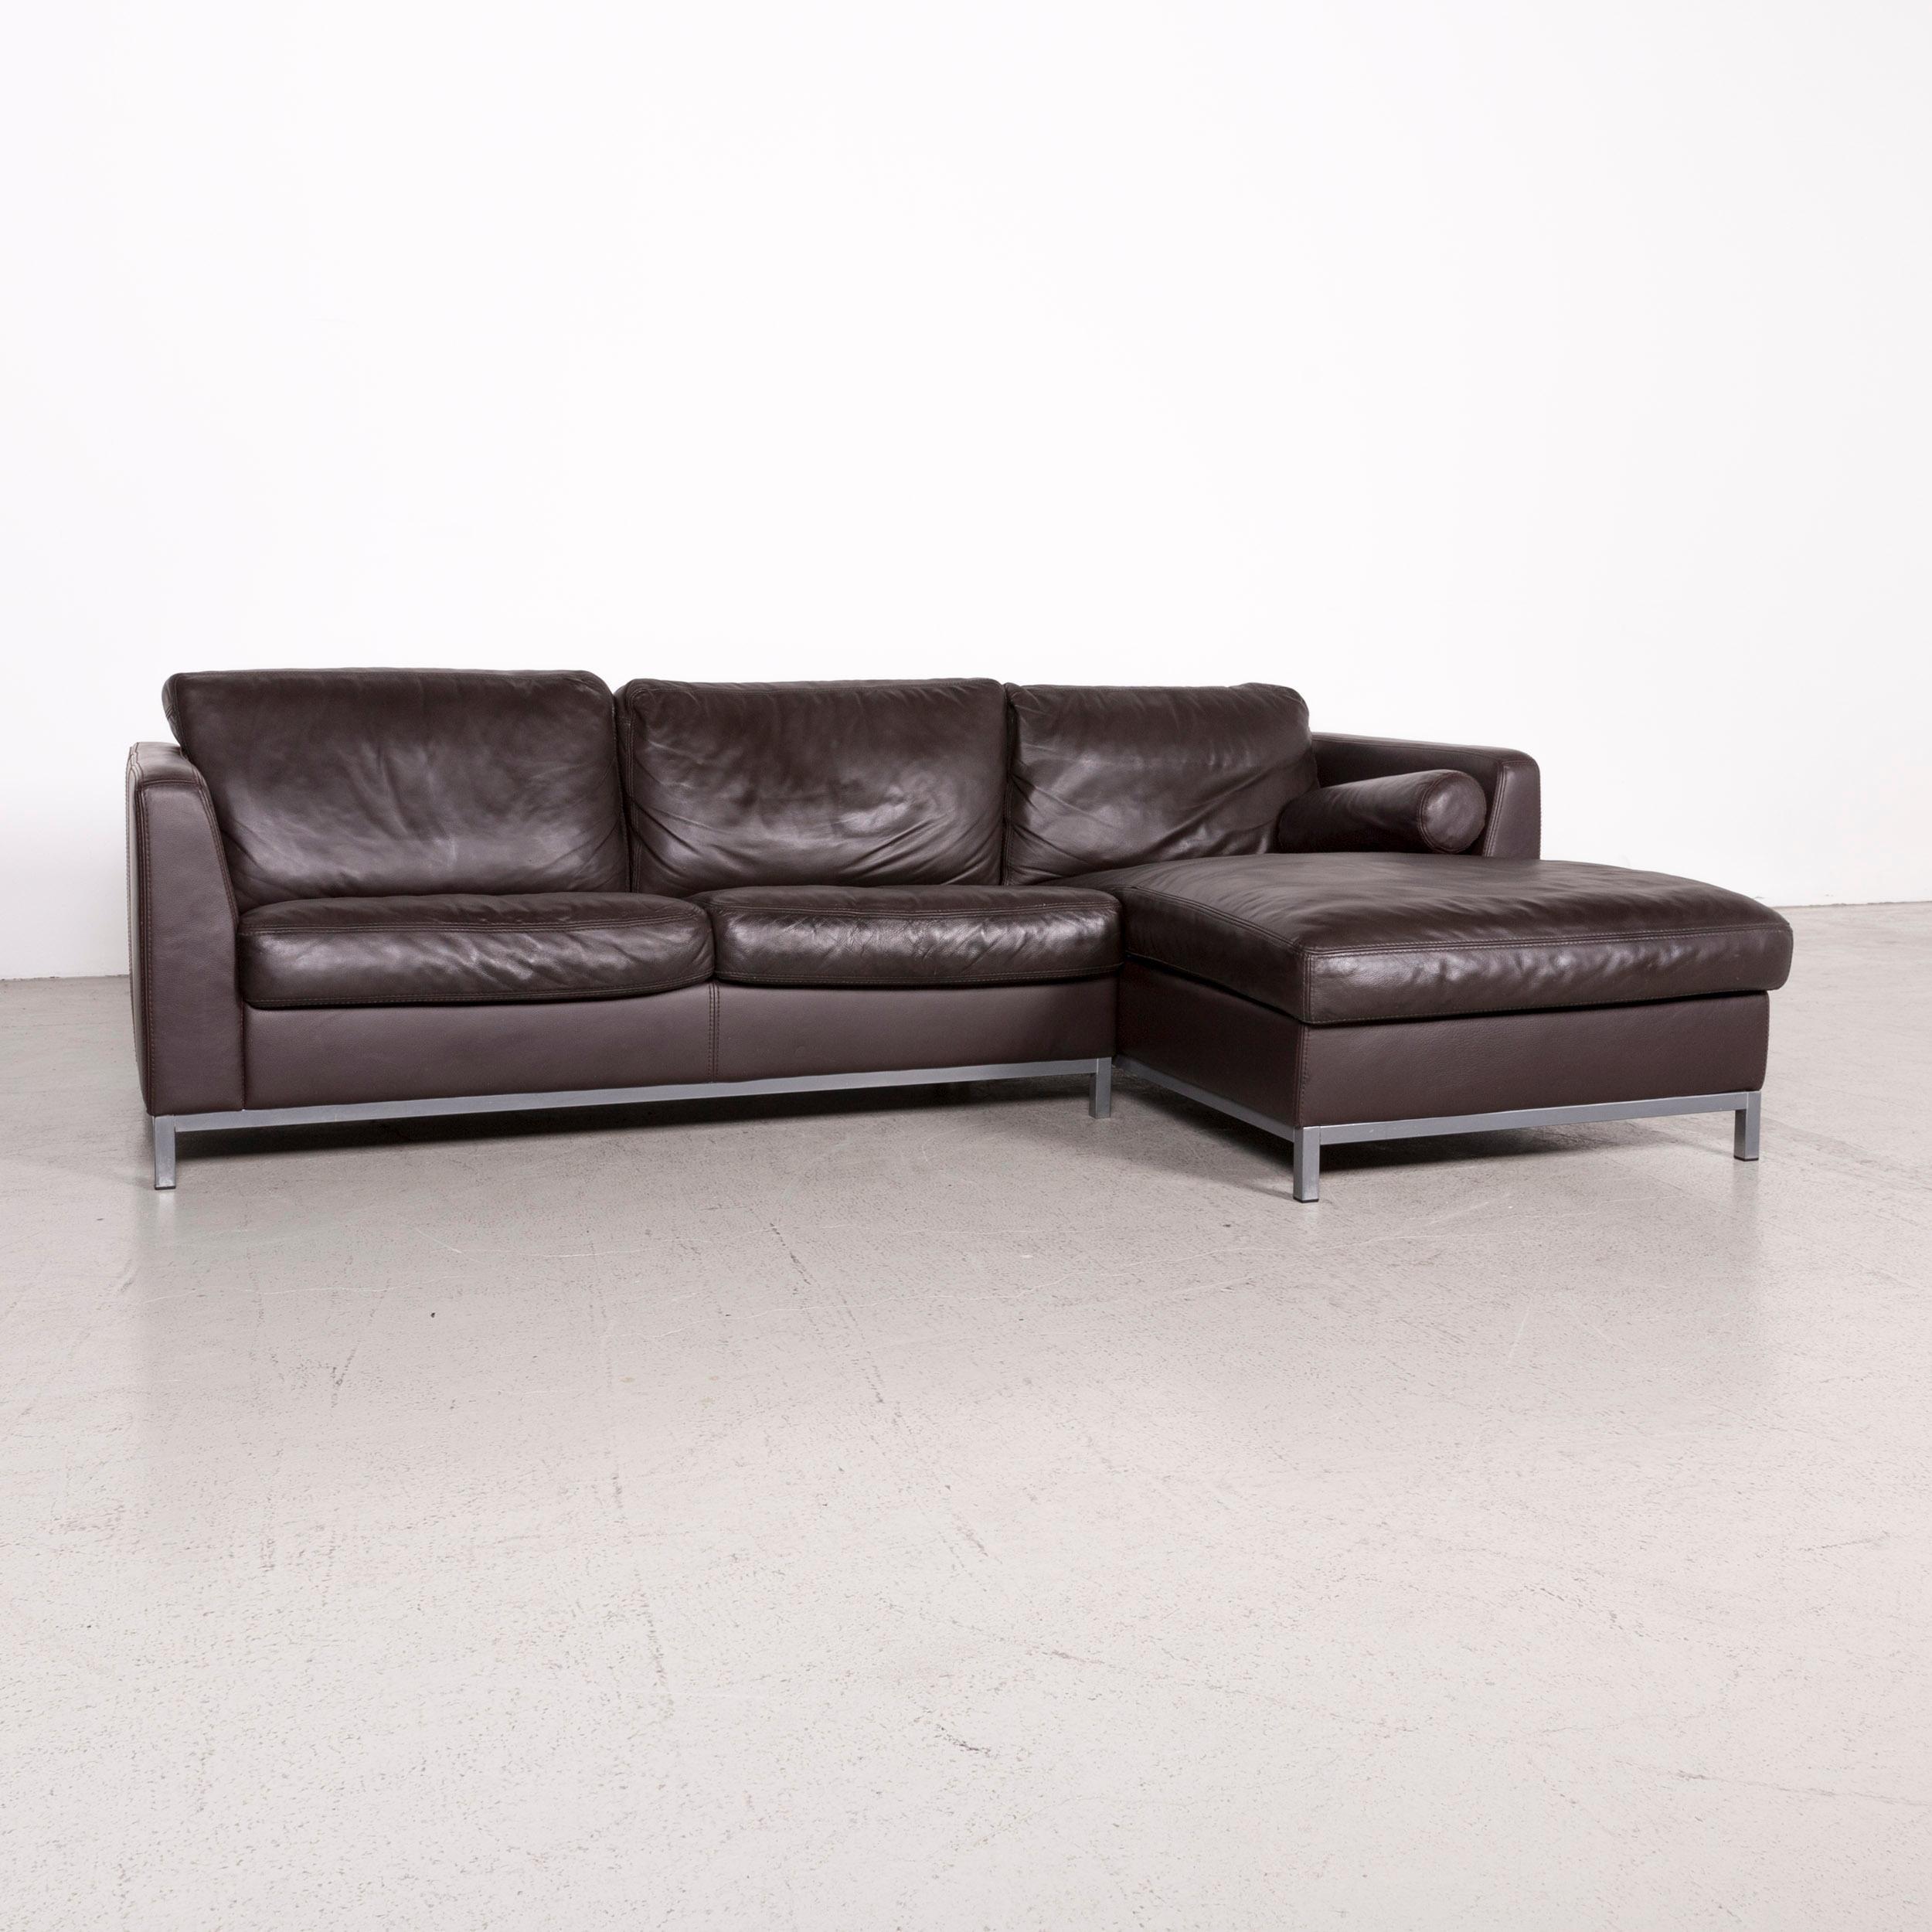 Machalke Designer Leather Corner Sofa Brown Genuine Leather Sofa Couch